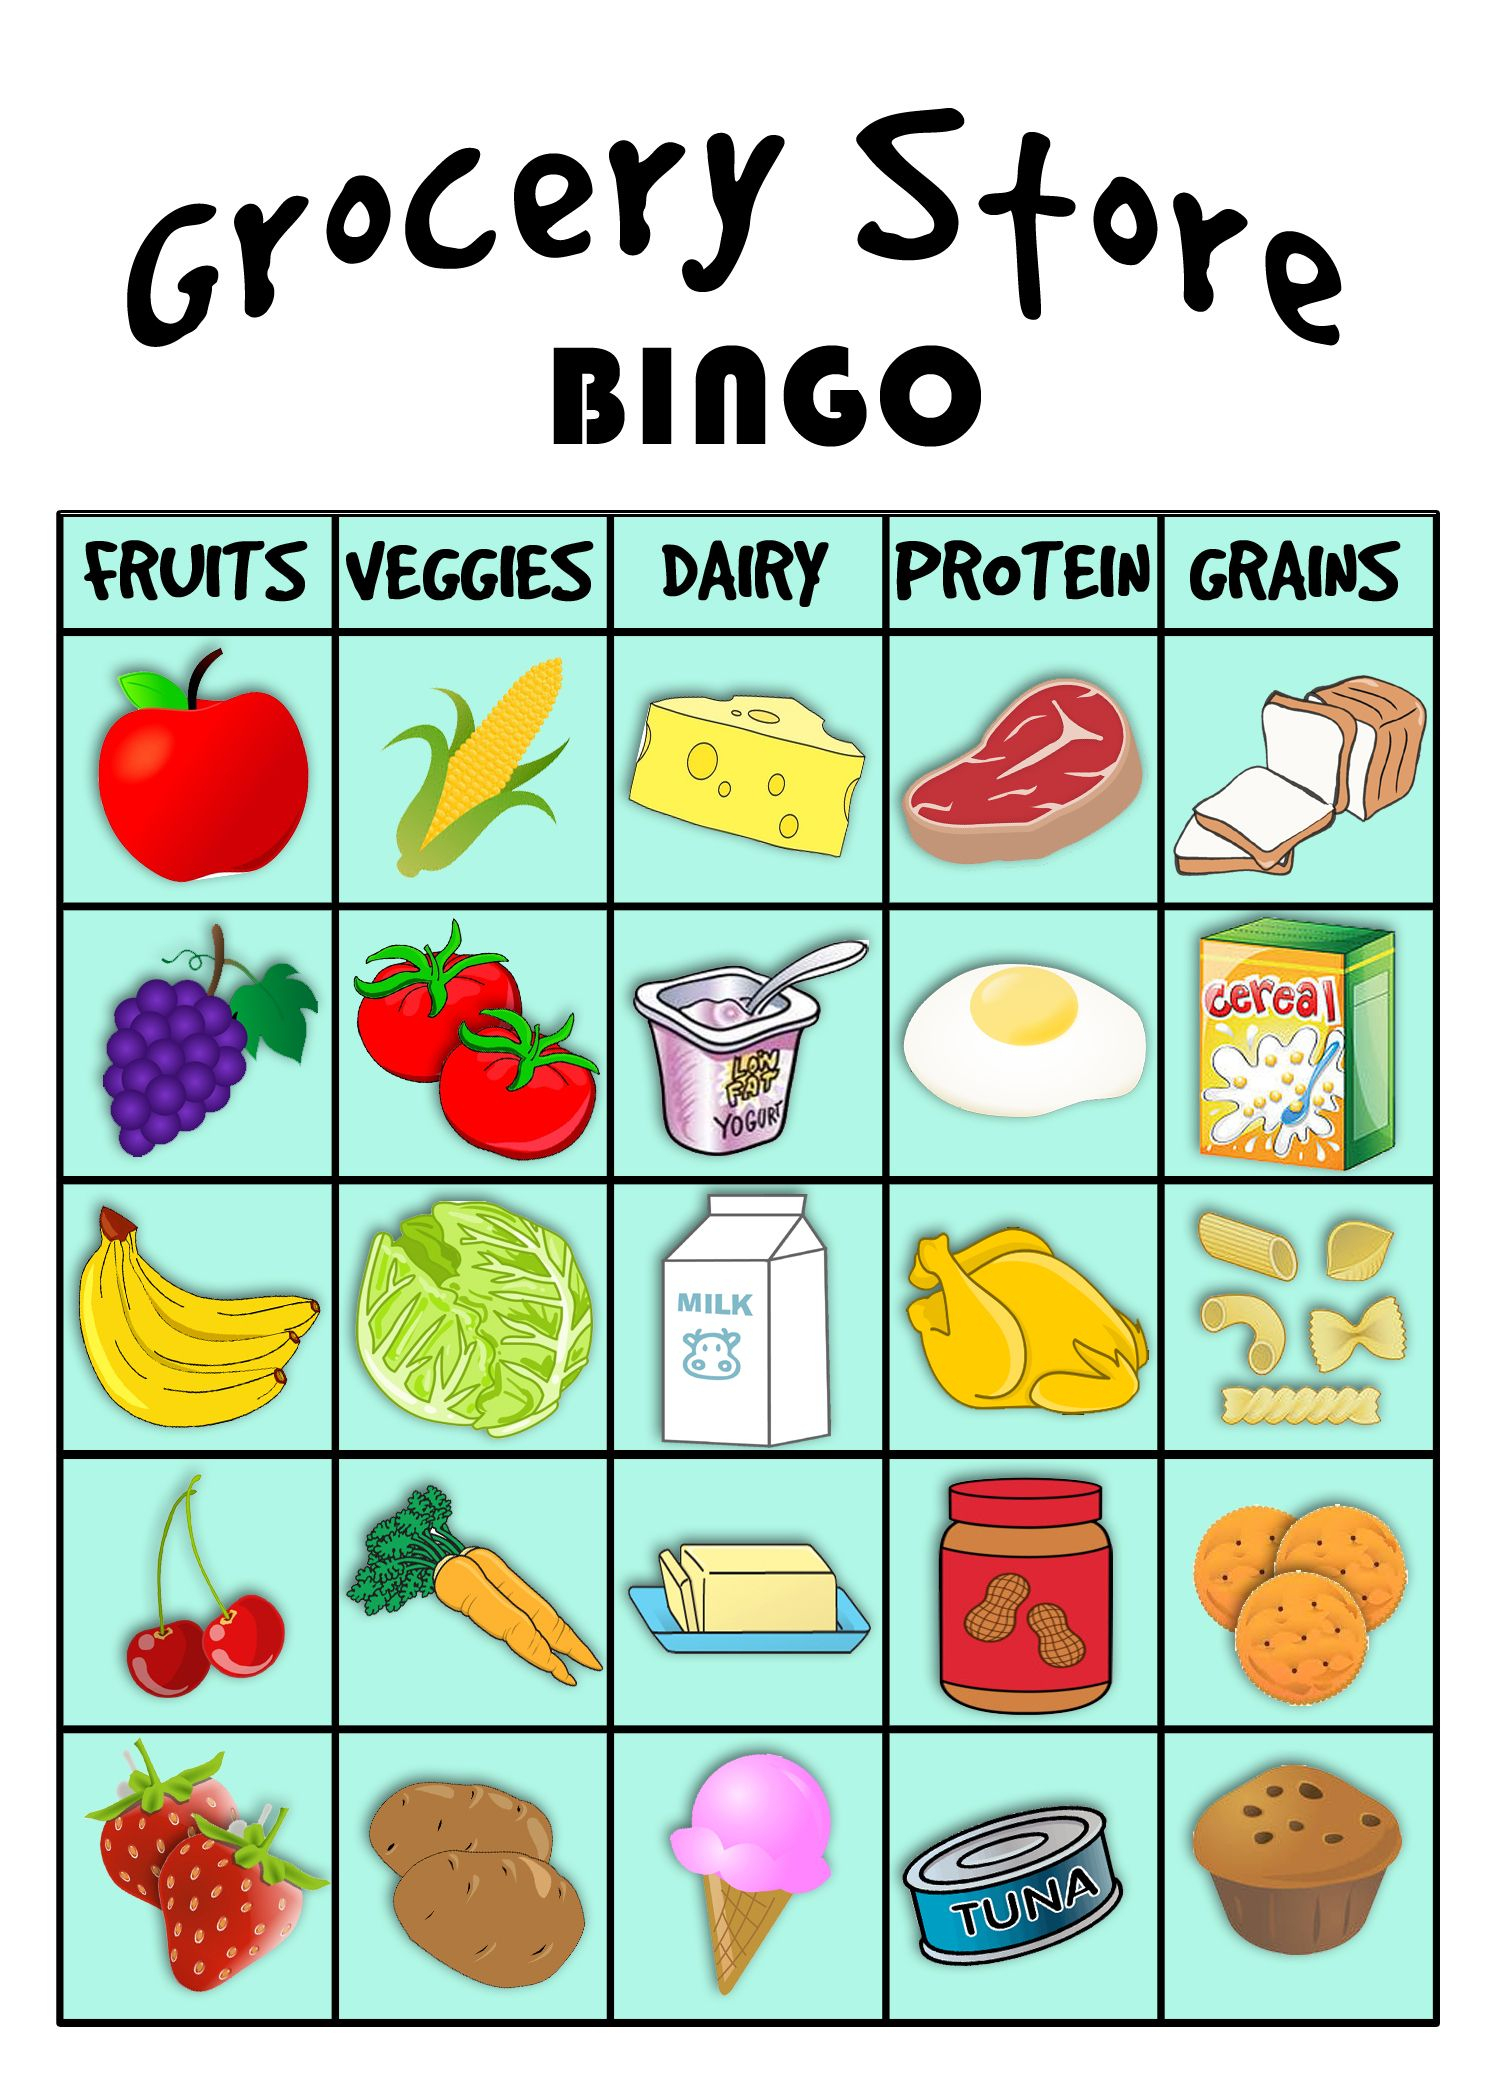 Grocery Store Bingo! | Preschool Food, Food Groups For Kids